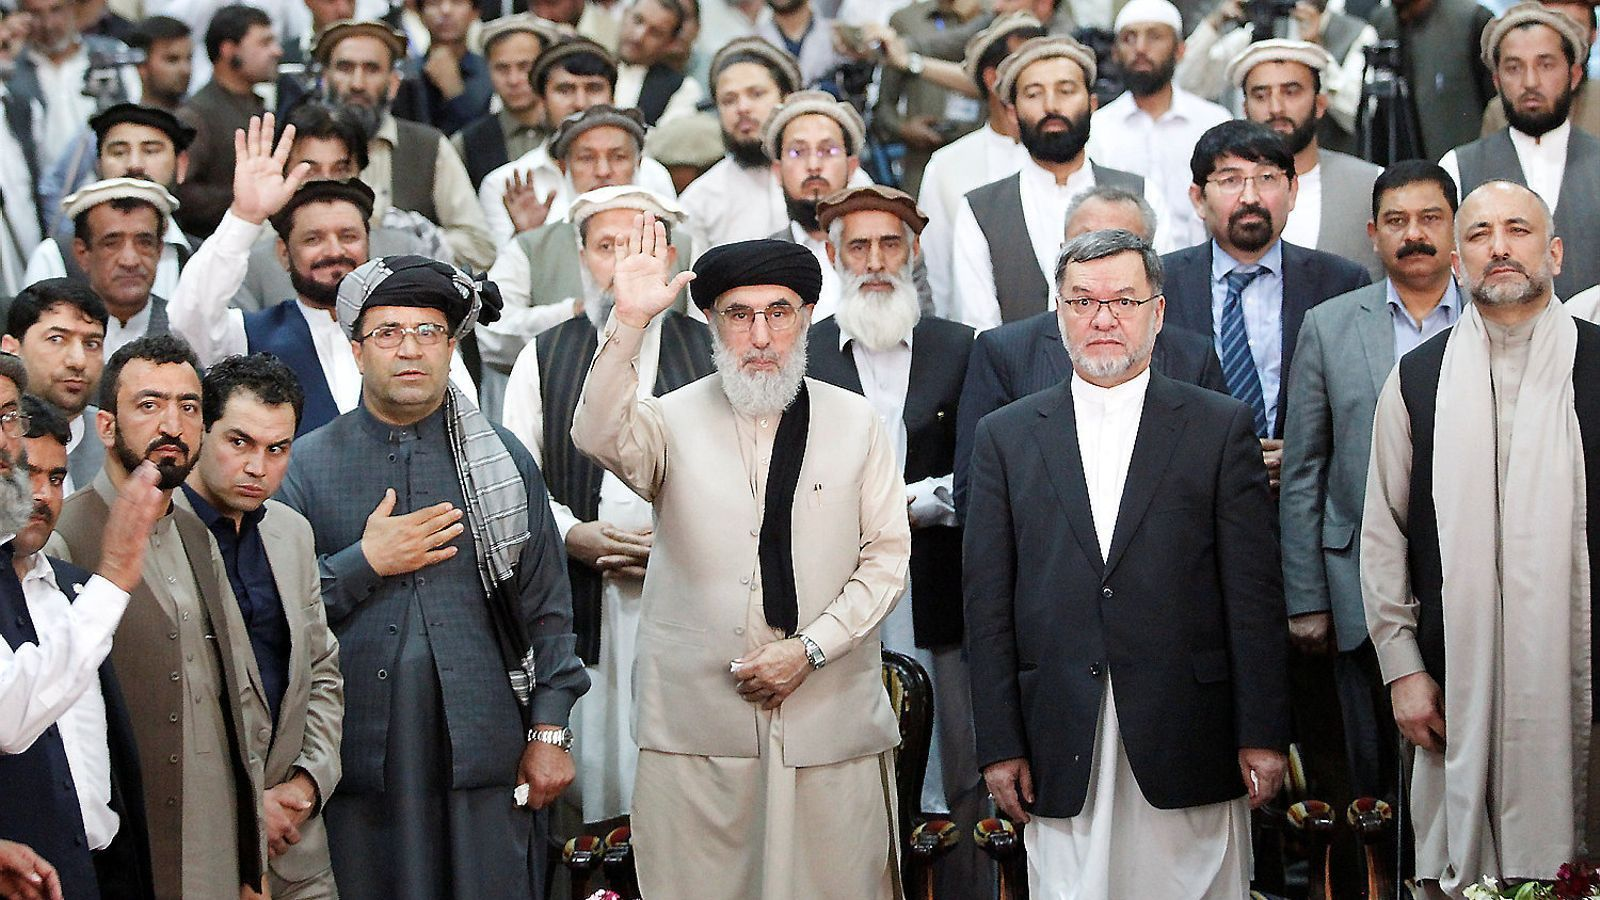 Gulbuddin Hekmatyar saludant amb la mà, al centre de la imatge.